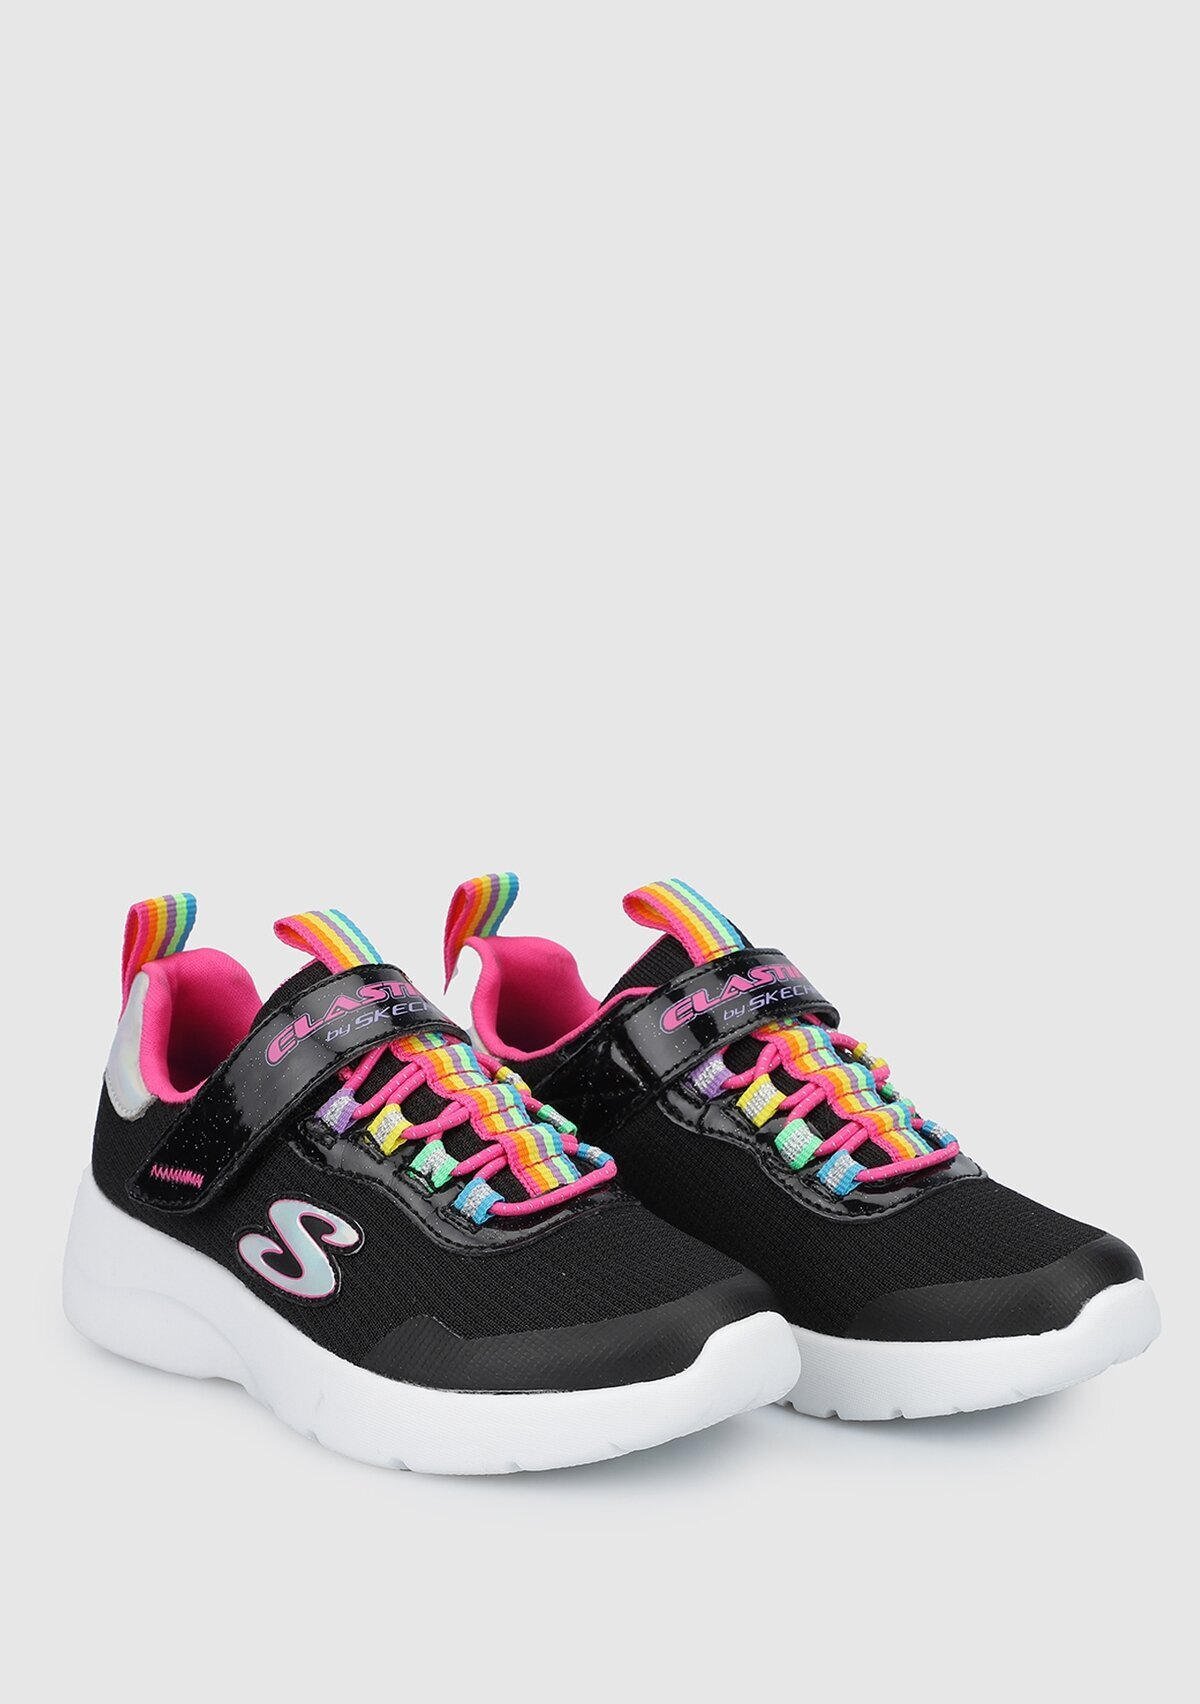 resm Dynamight 2.0 Siyah Kız Çocuk Sneaker 302464L BKMT